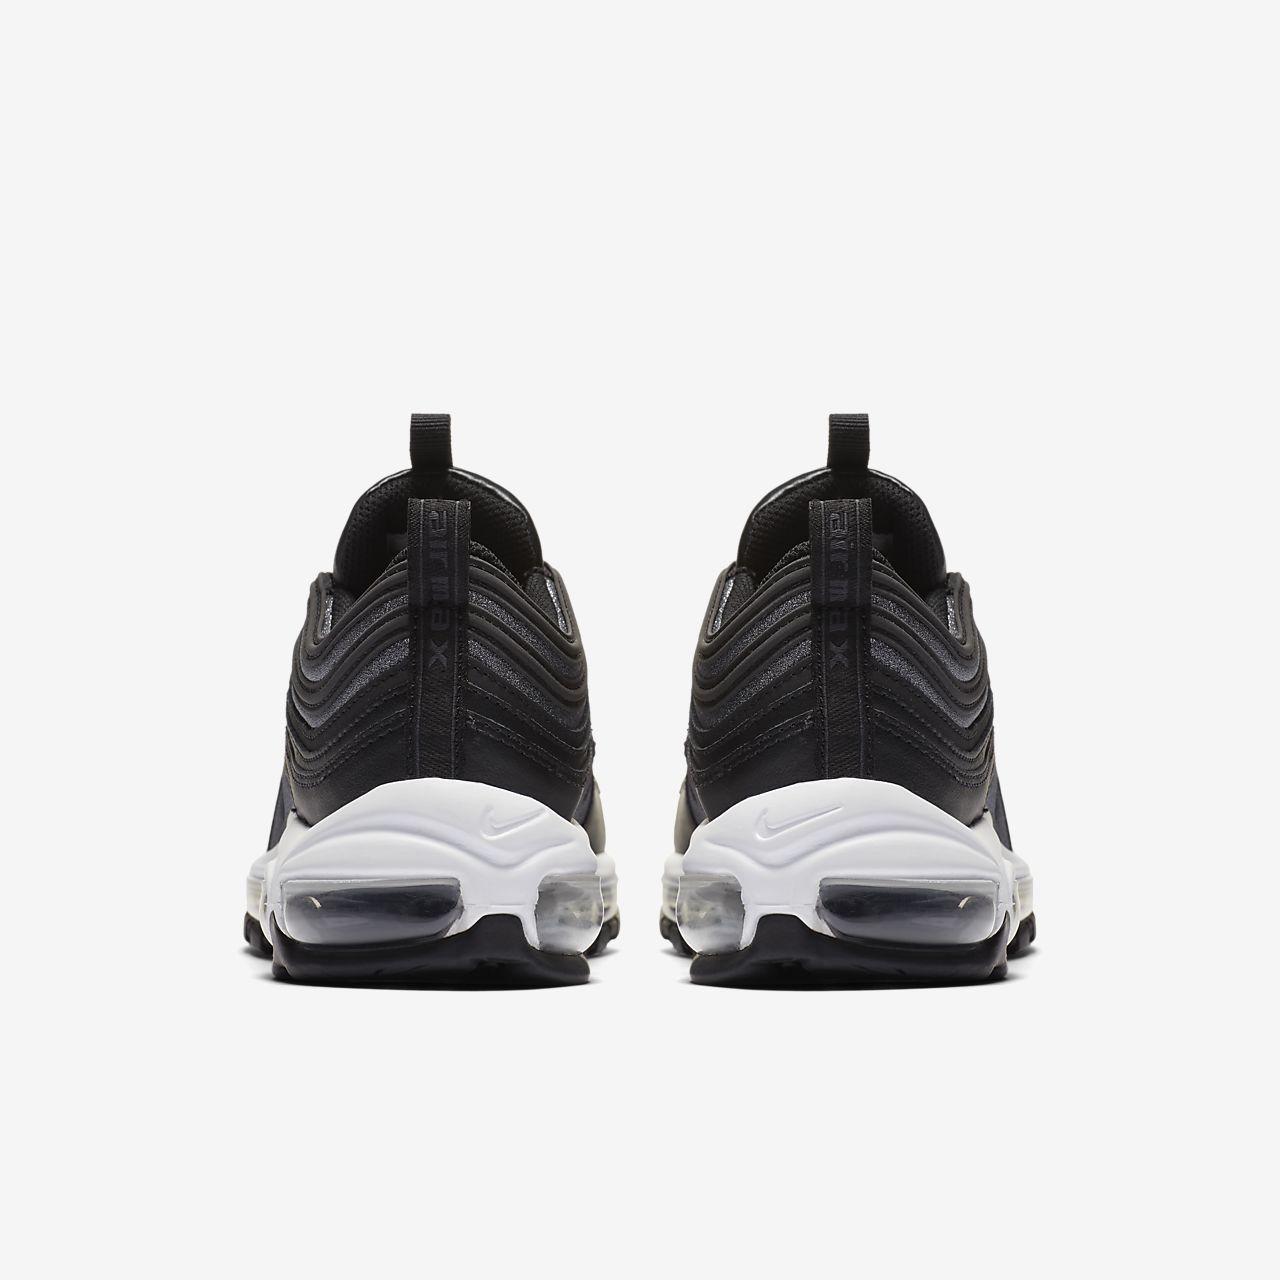 aea4c685ed scarpa nike air max 97 glitter nero/bianco/nero at0071-002